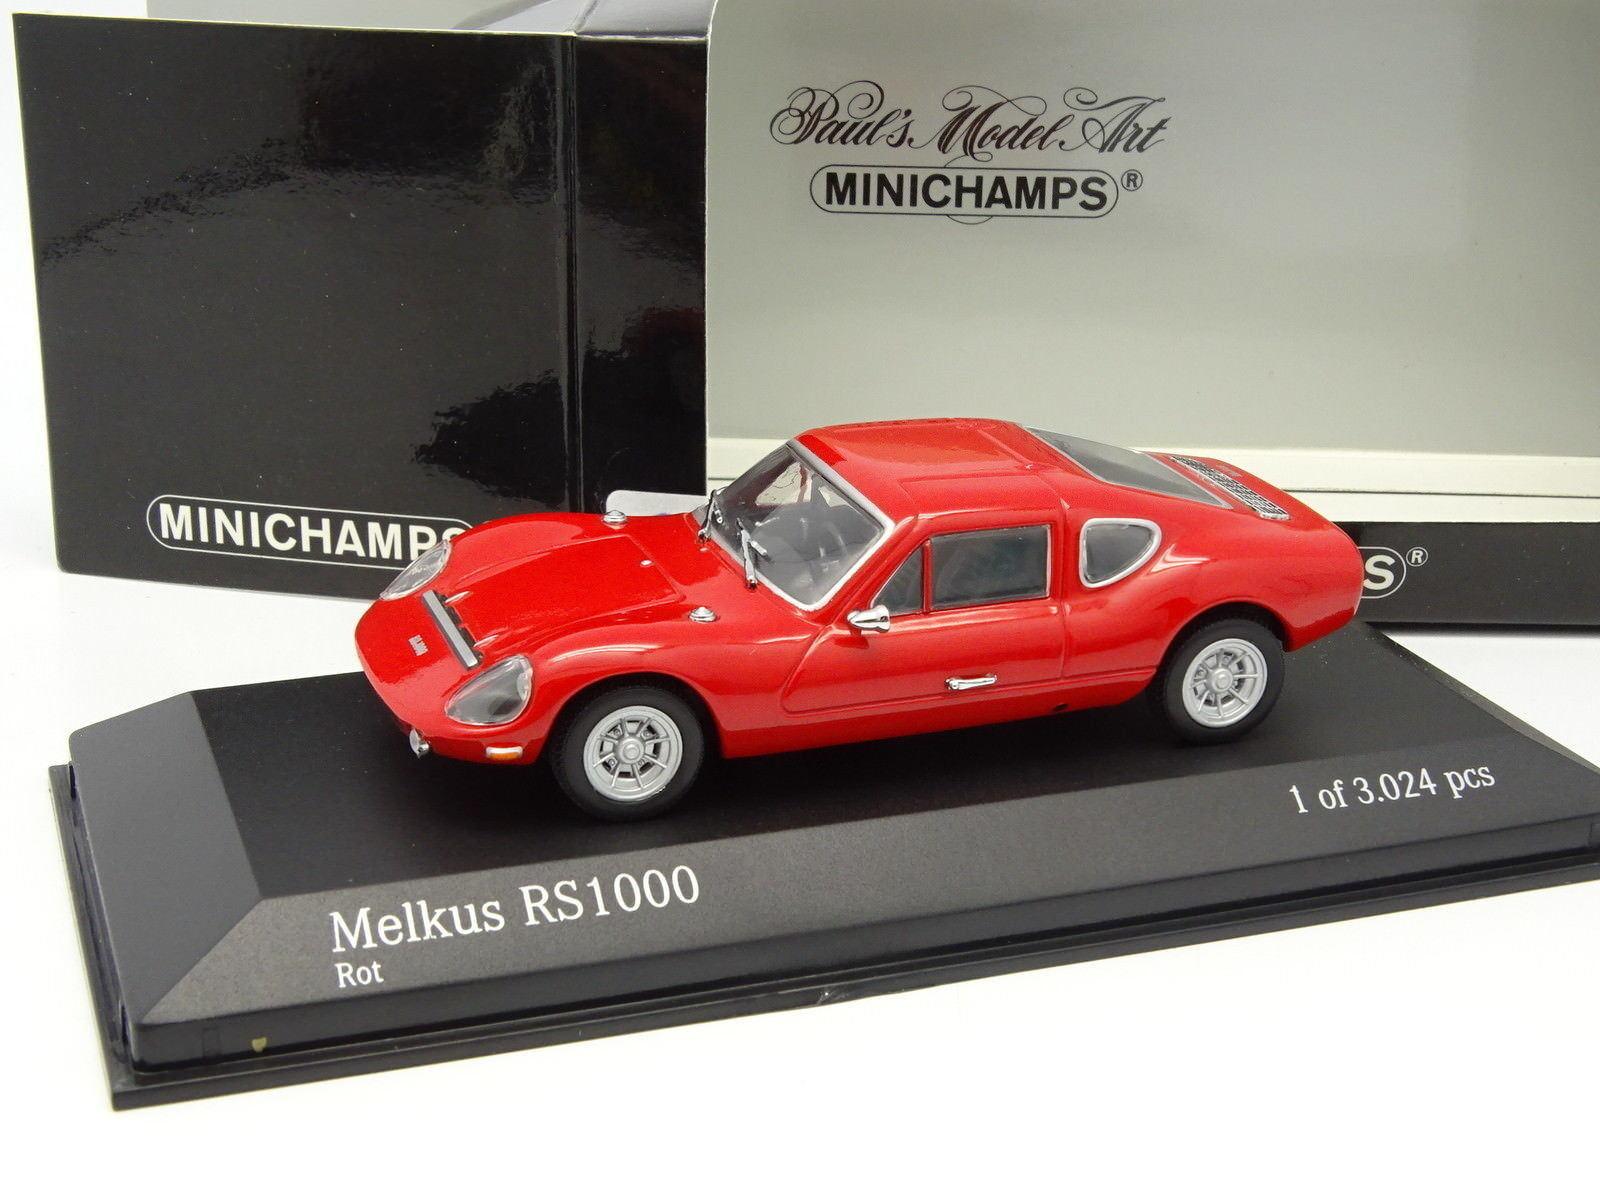 Minichamps 1 43 - Melkus rs 1000 1972 red